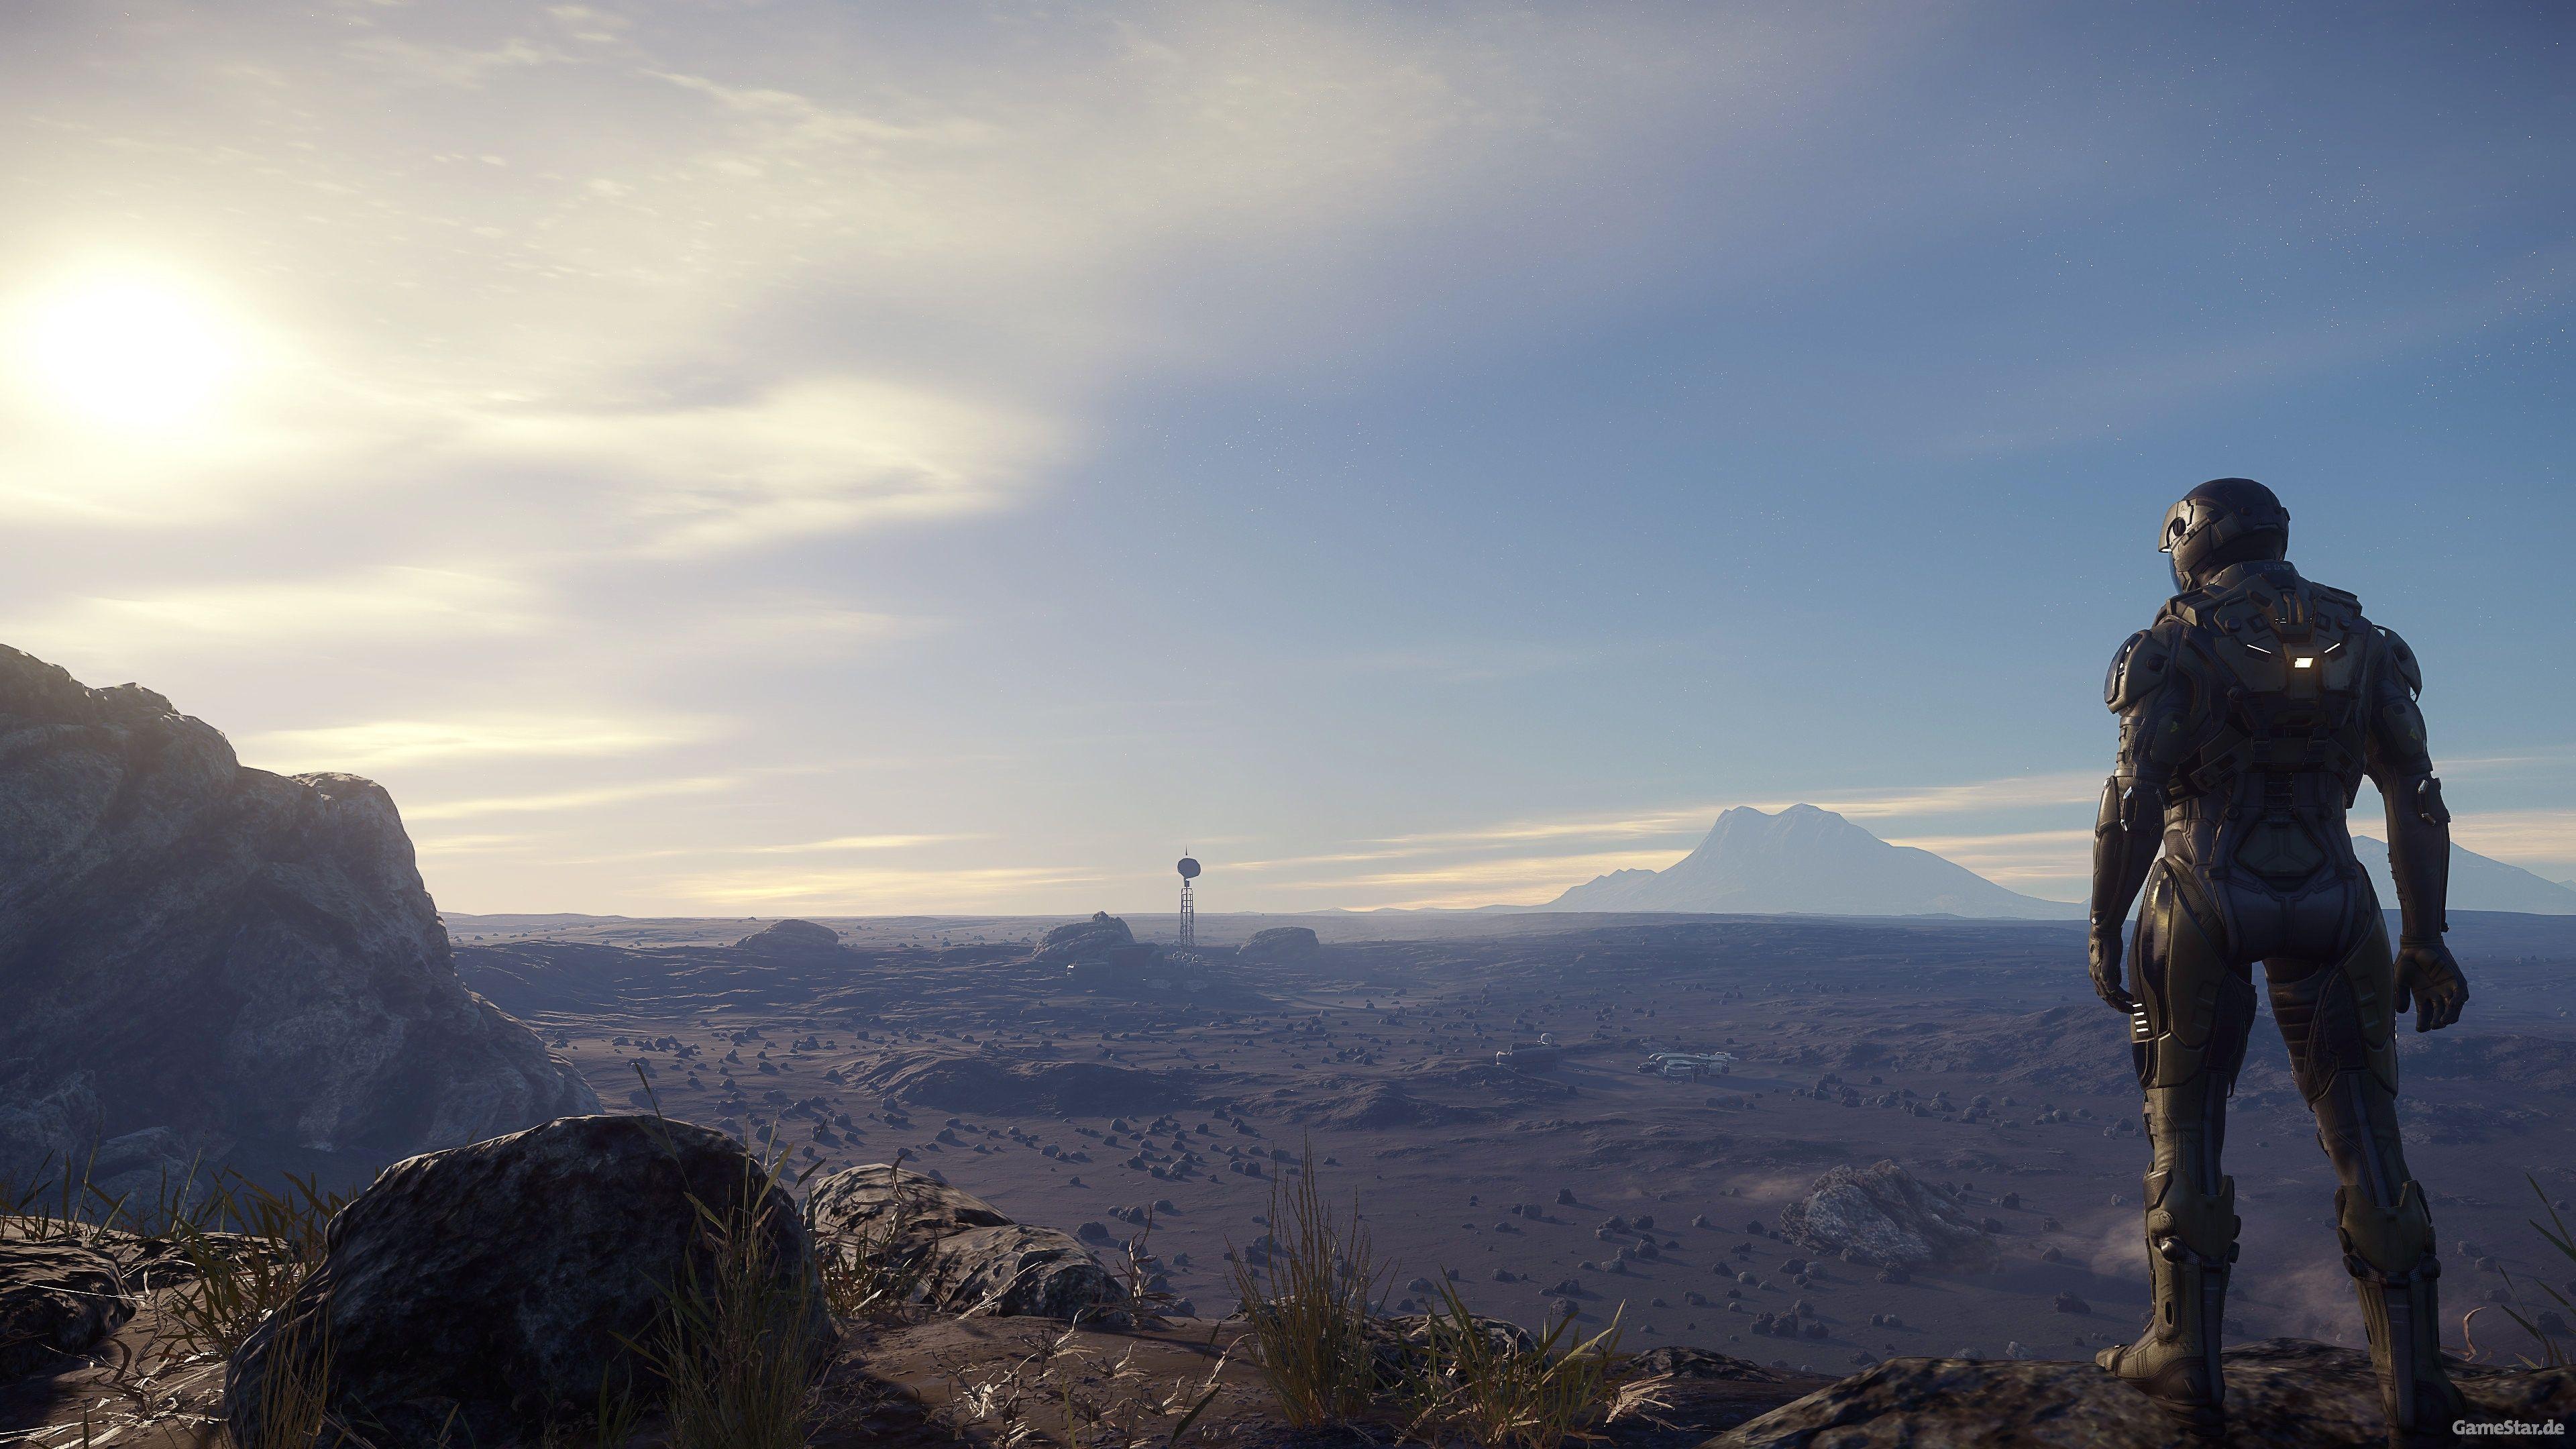 Homme debout regardant l'horizon